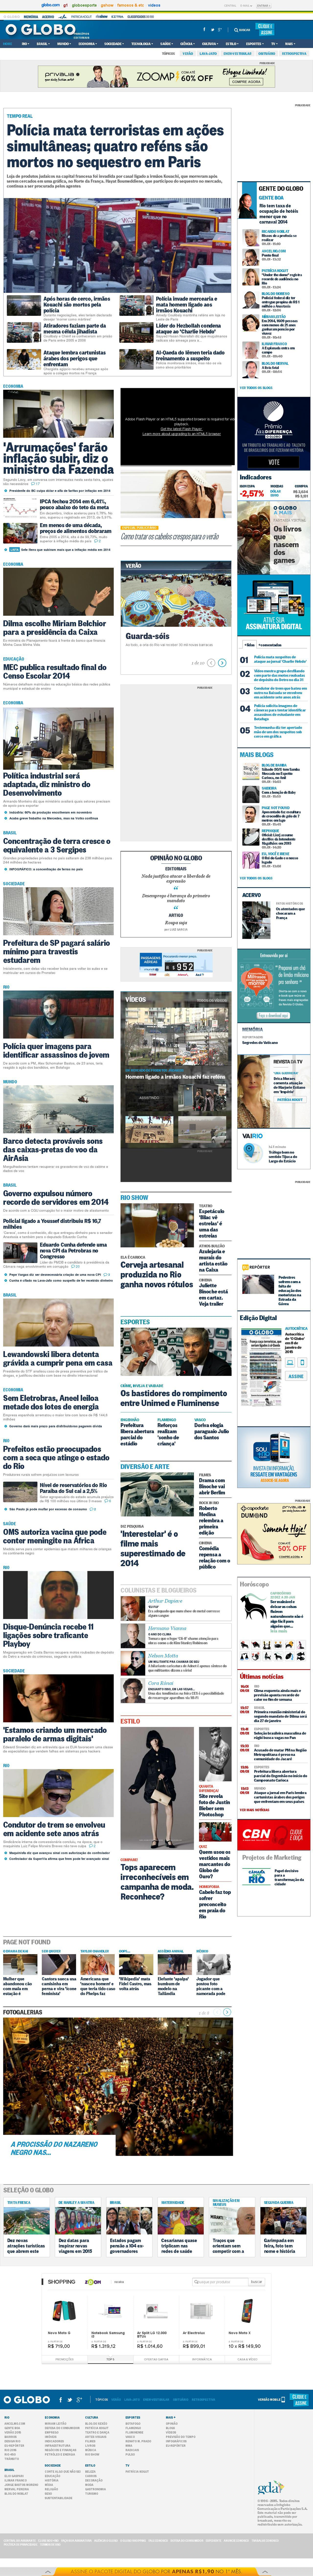 O Globo at Friday Jan. 9, 2015, 6:09 p.m. UTC